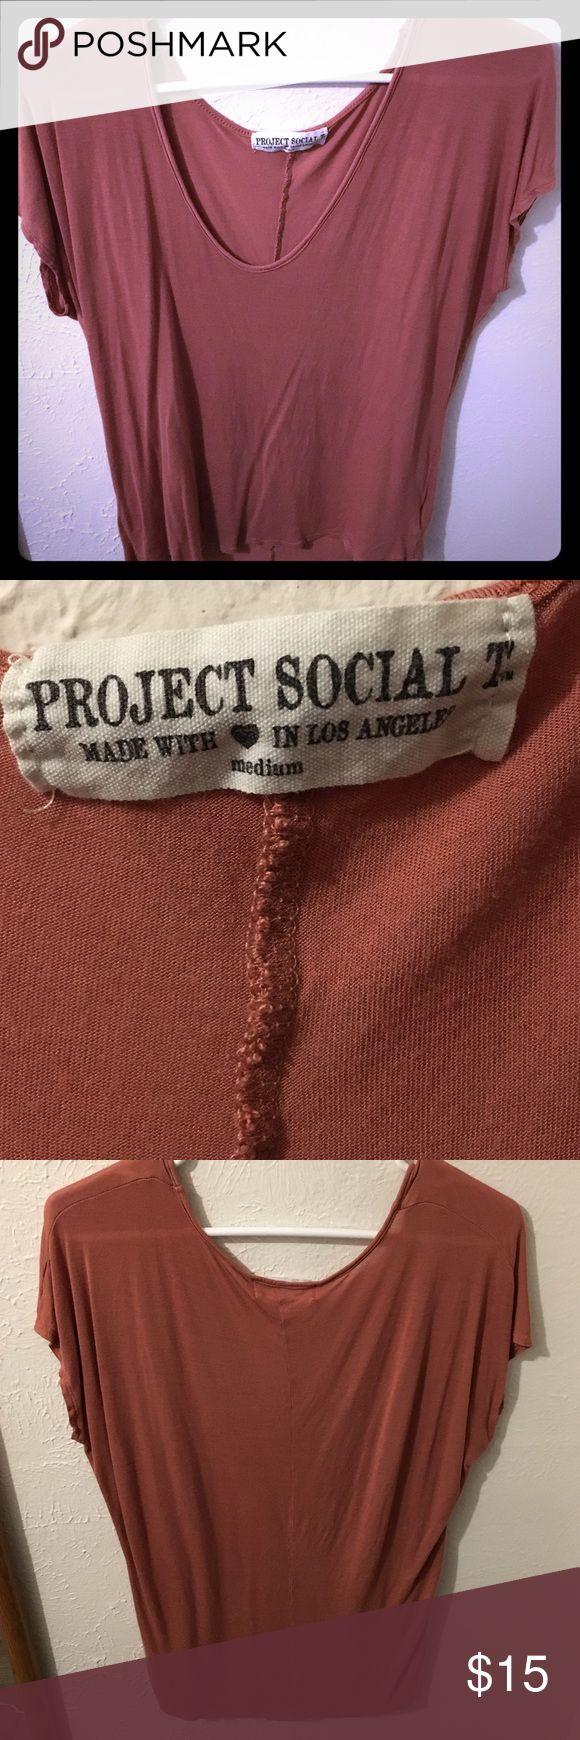 Burnt Orange Tee Project Social T Tee Project Social T Tops